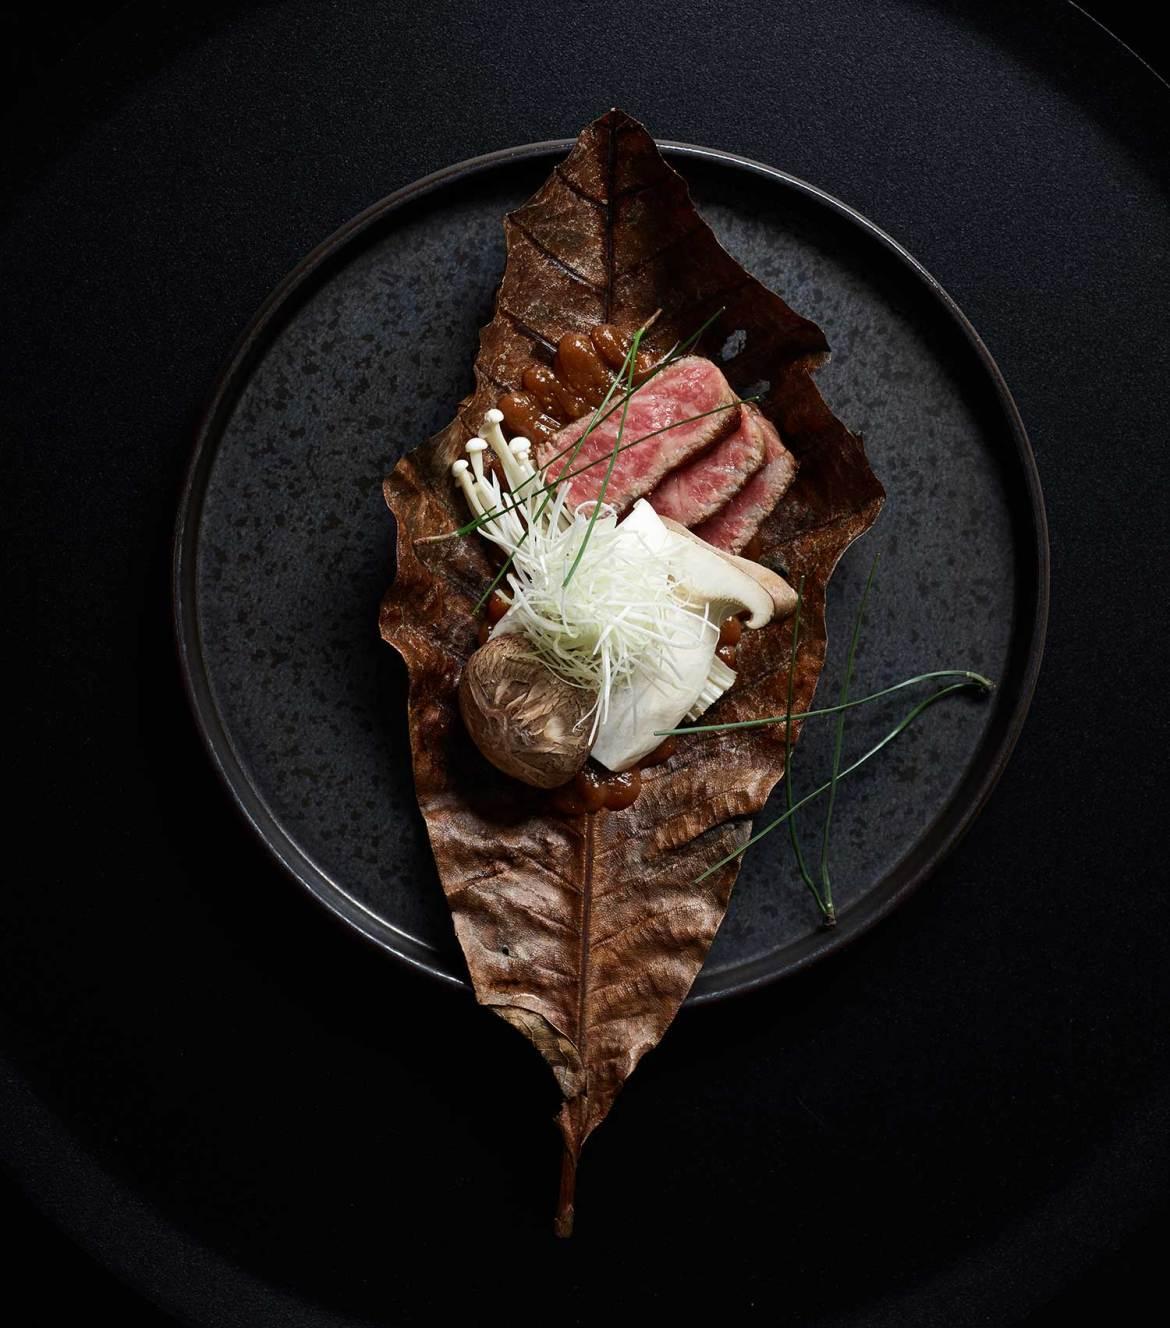 Ishizuka Melbourne - Daimono, - Grilled Kagoshima A5 Wagyu, hoba miso, grilled mushrooms